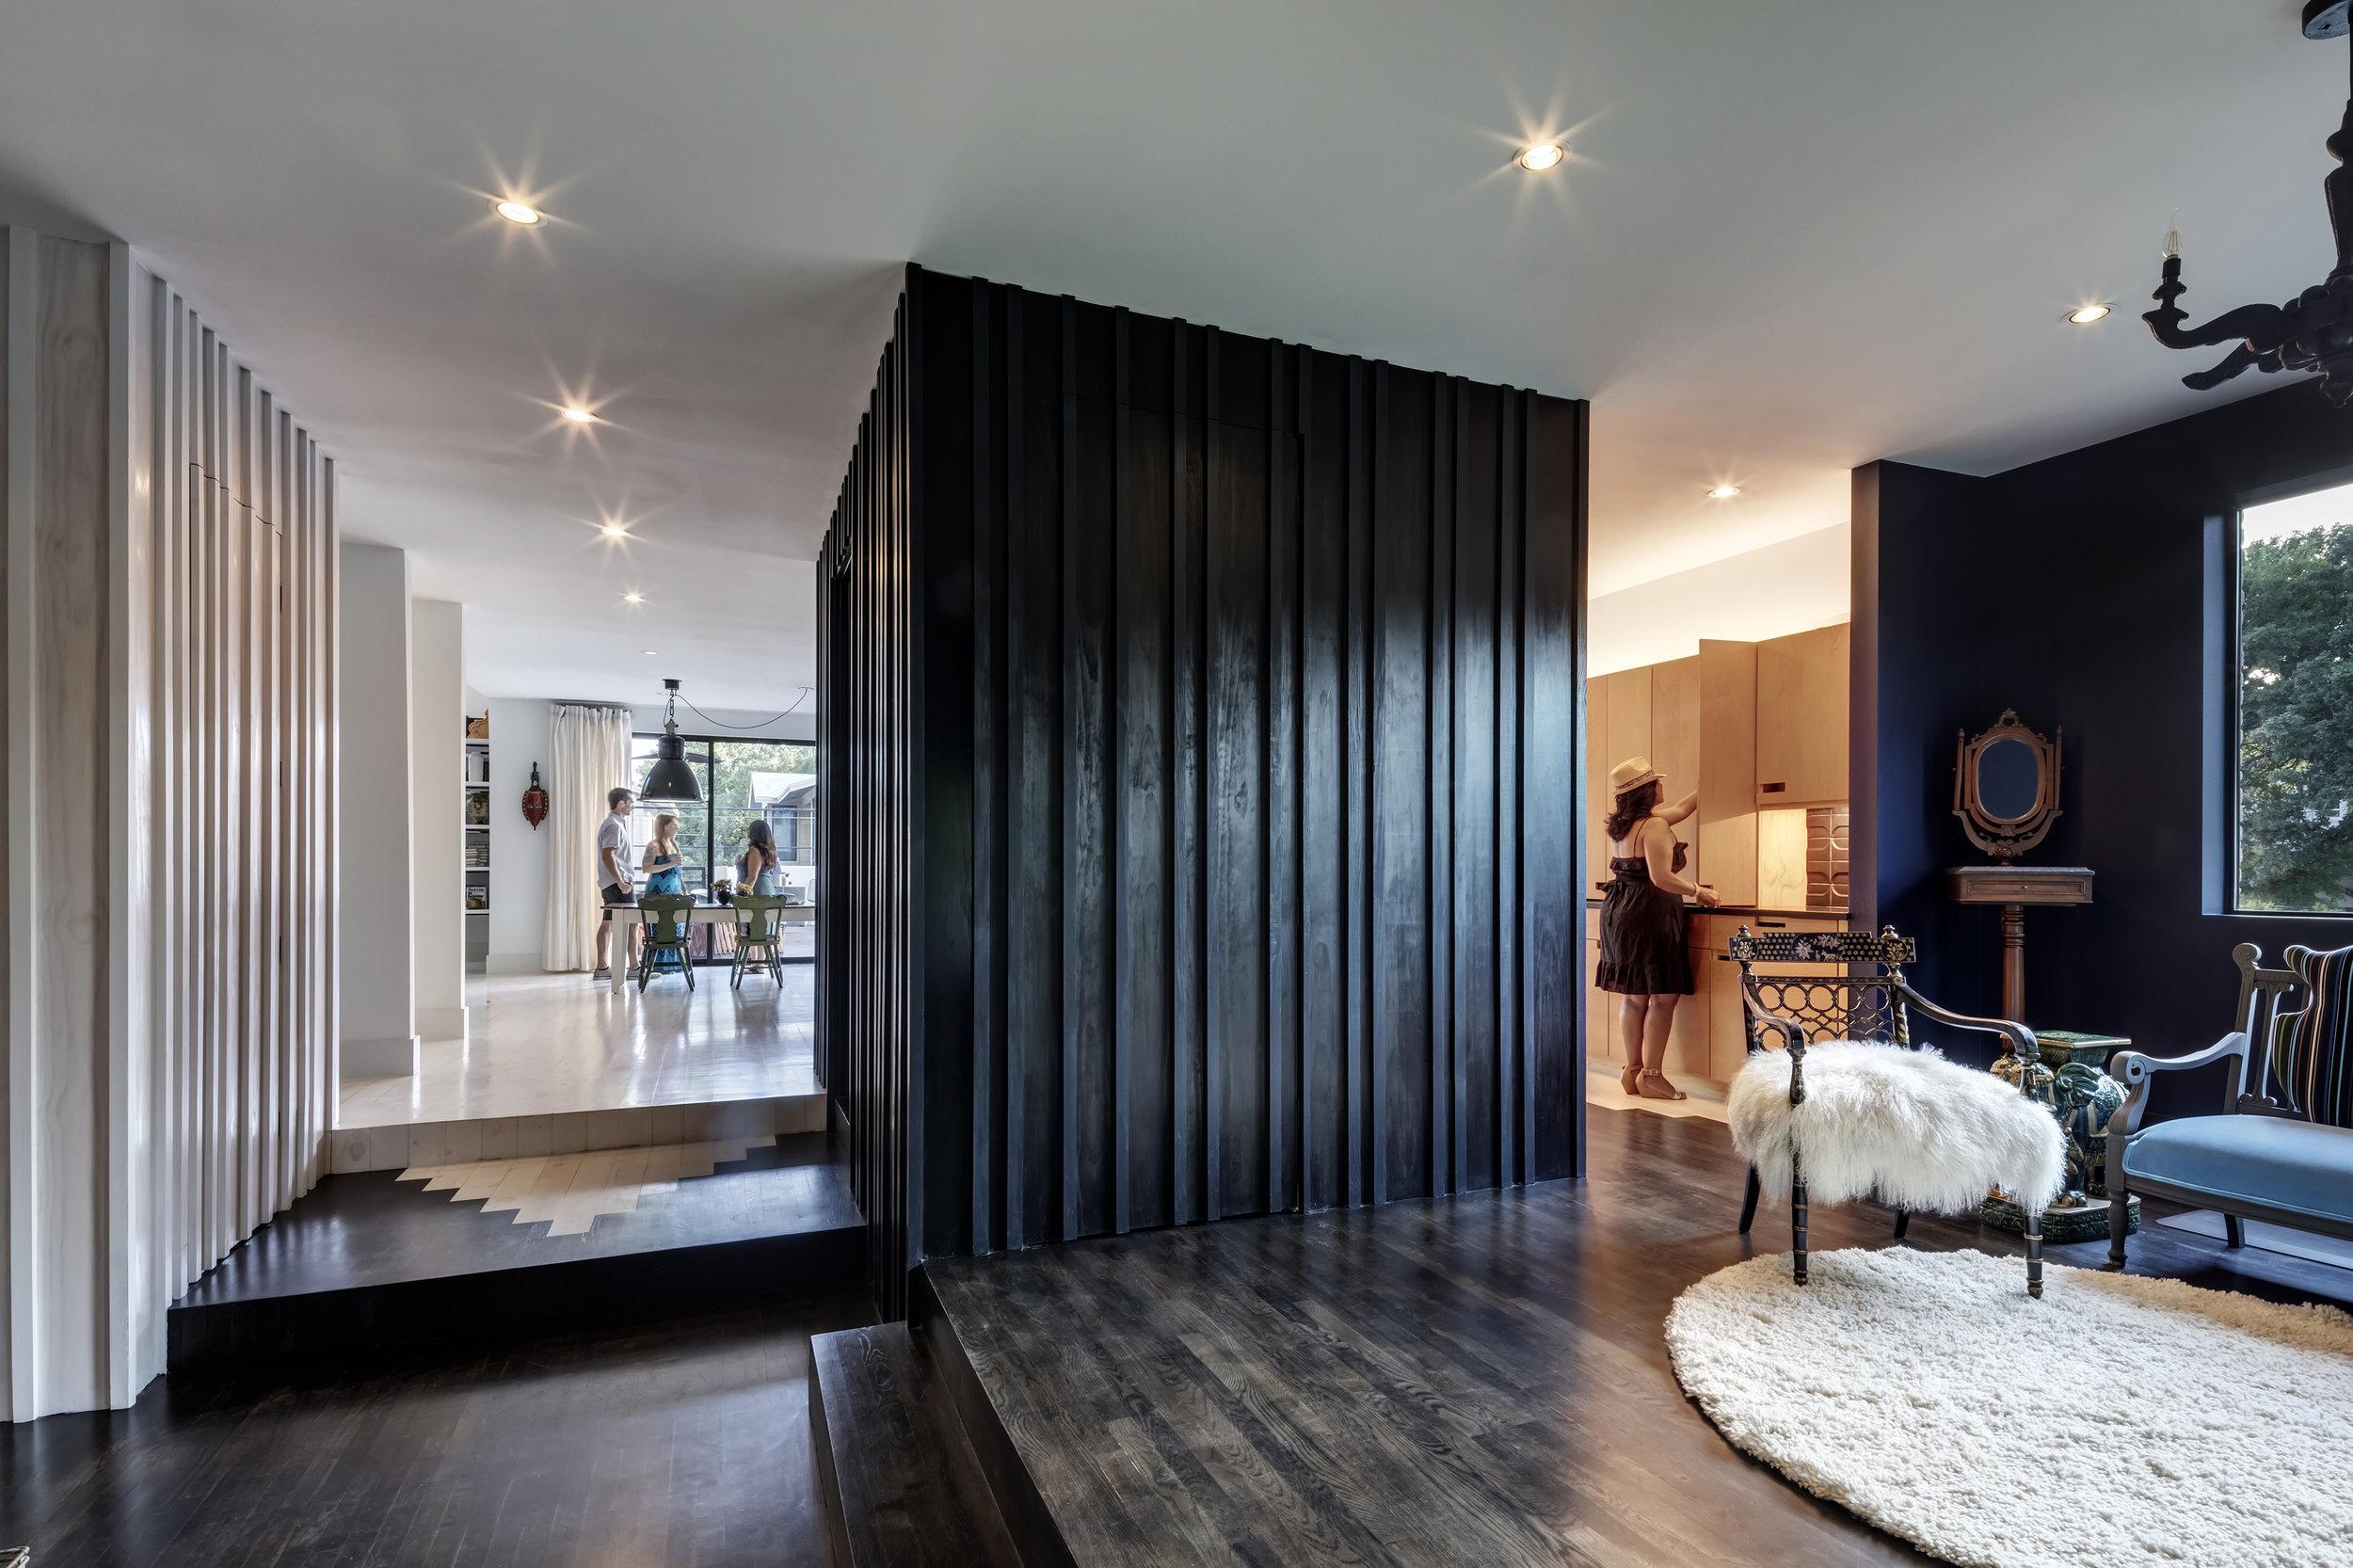 08 Mullet House by Matt Fajkus Architecture. Photo by Charles Davis Smith.jpg